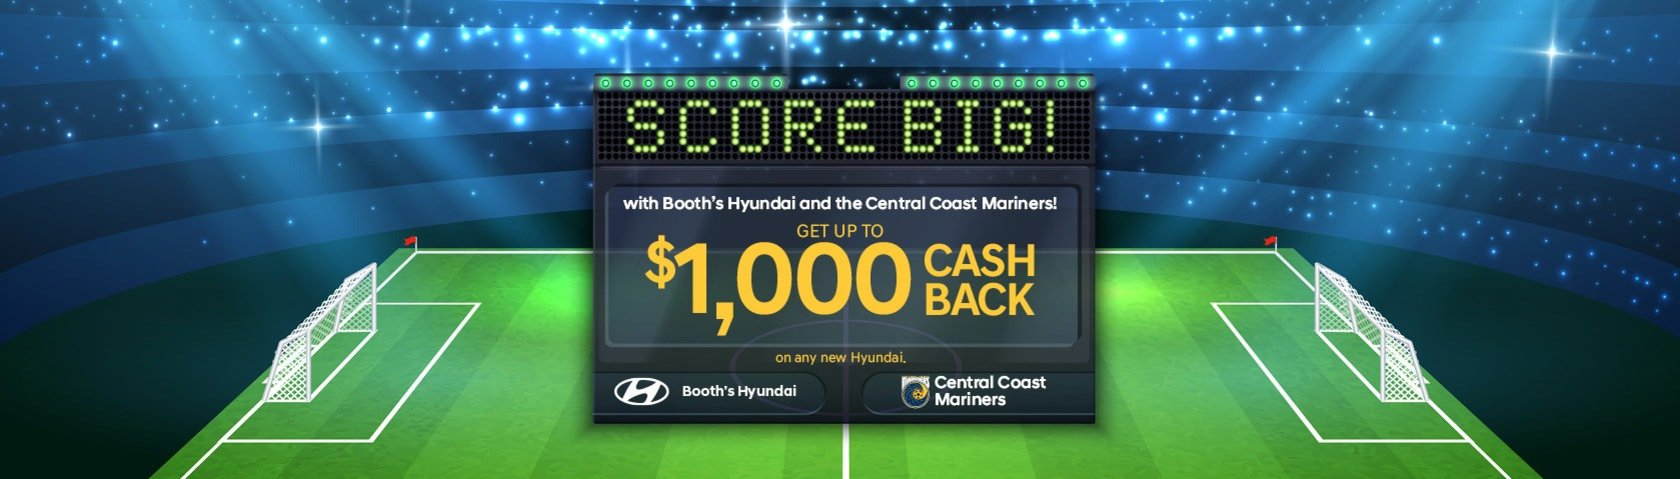 BoothsHyundai-Score Big